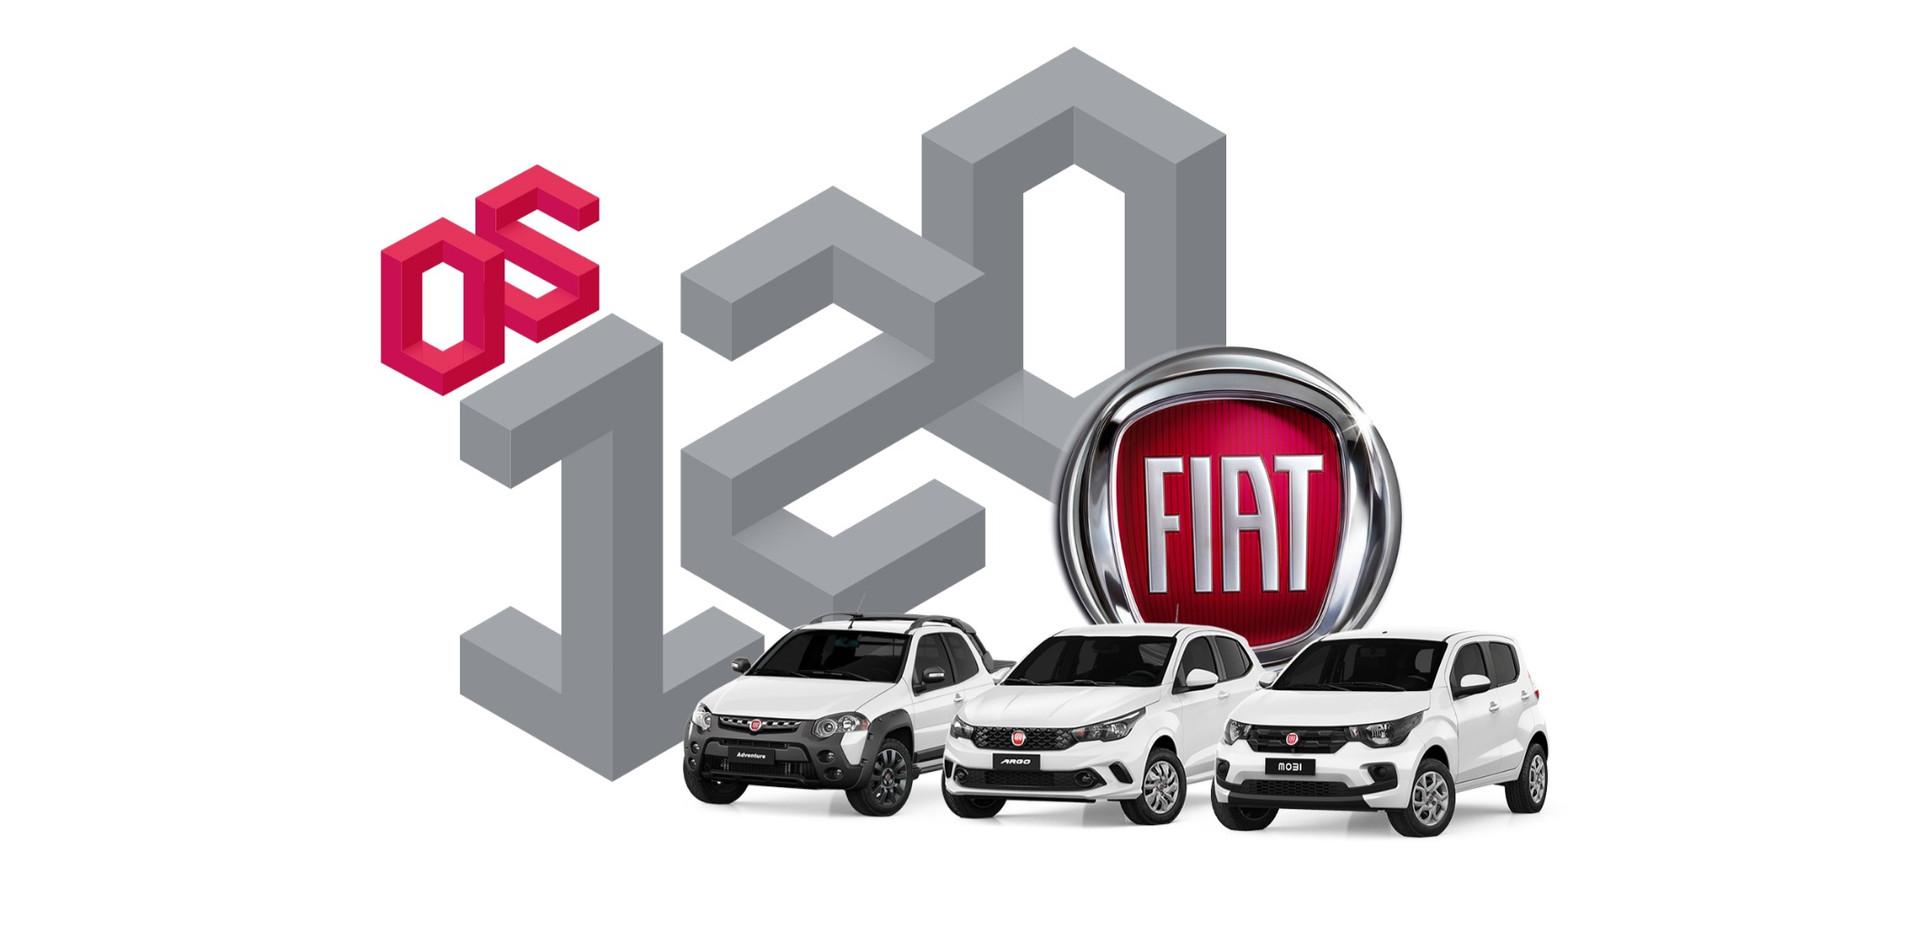 logo_fiat_jeep_editado.jpg